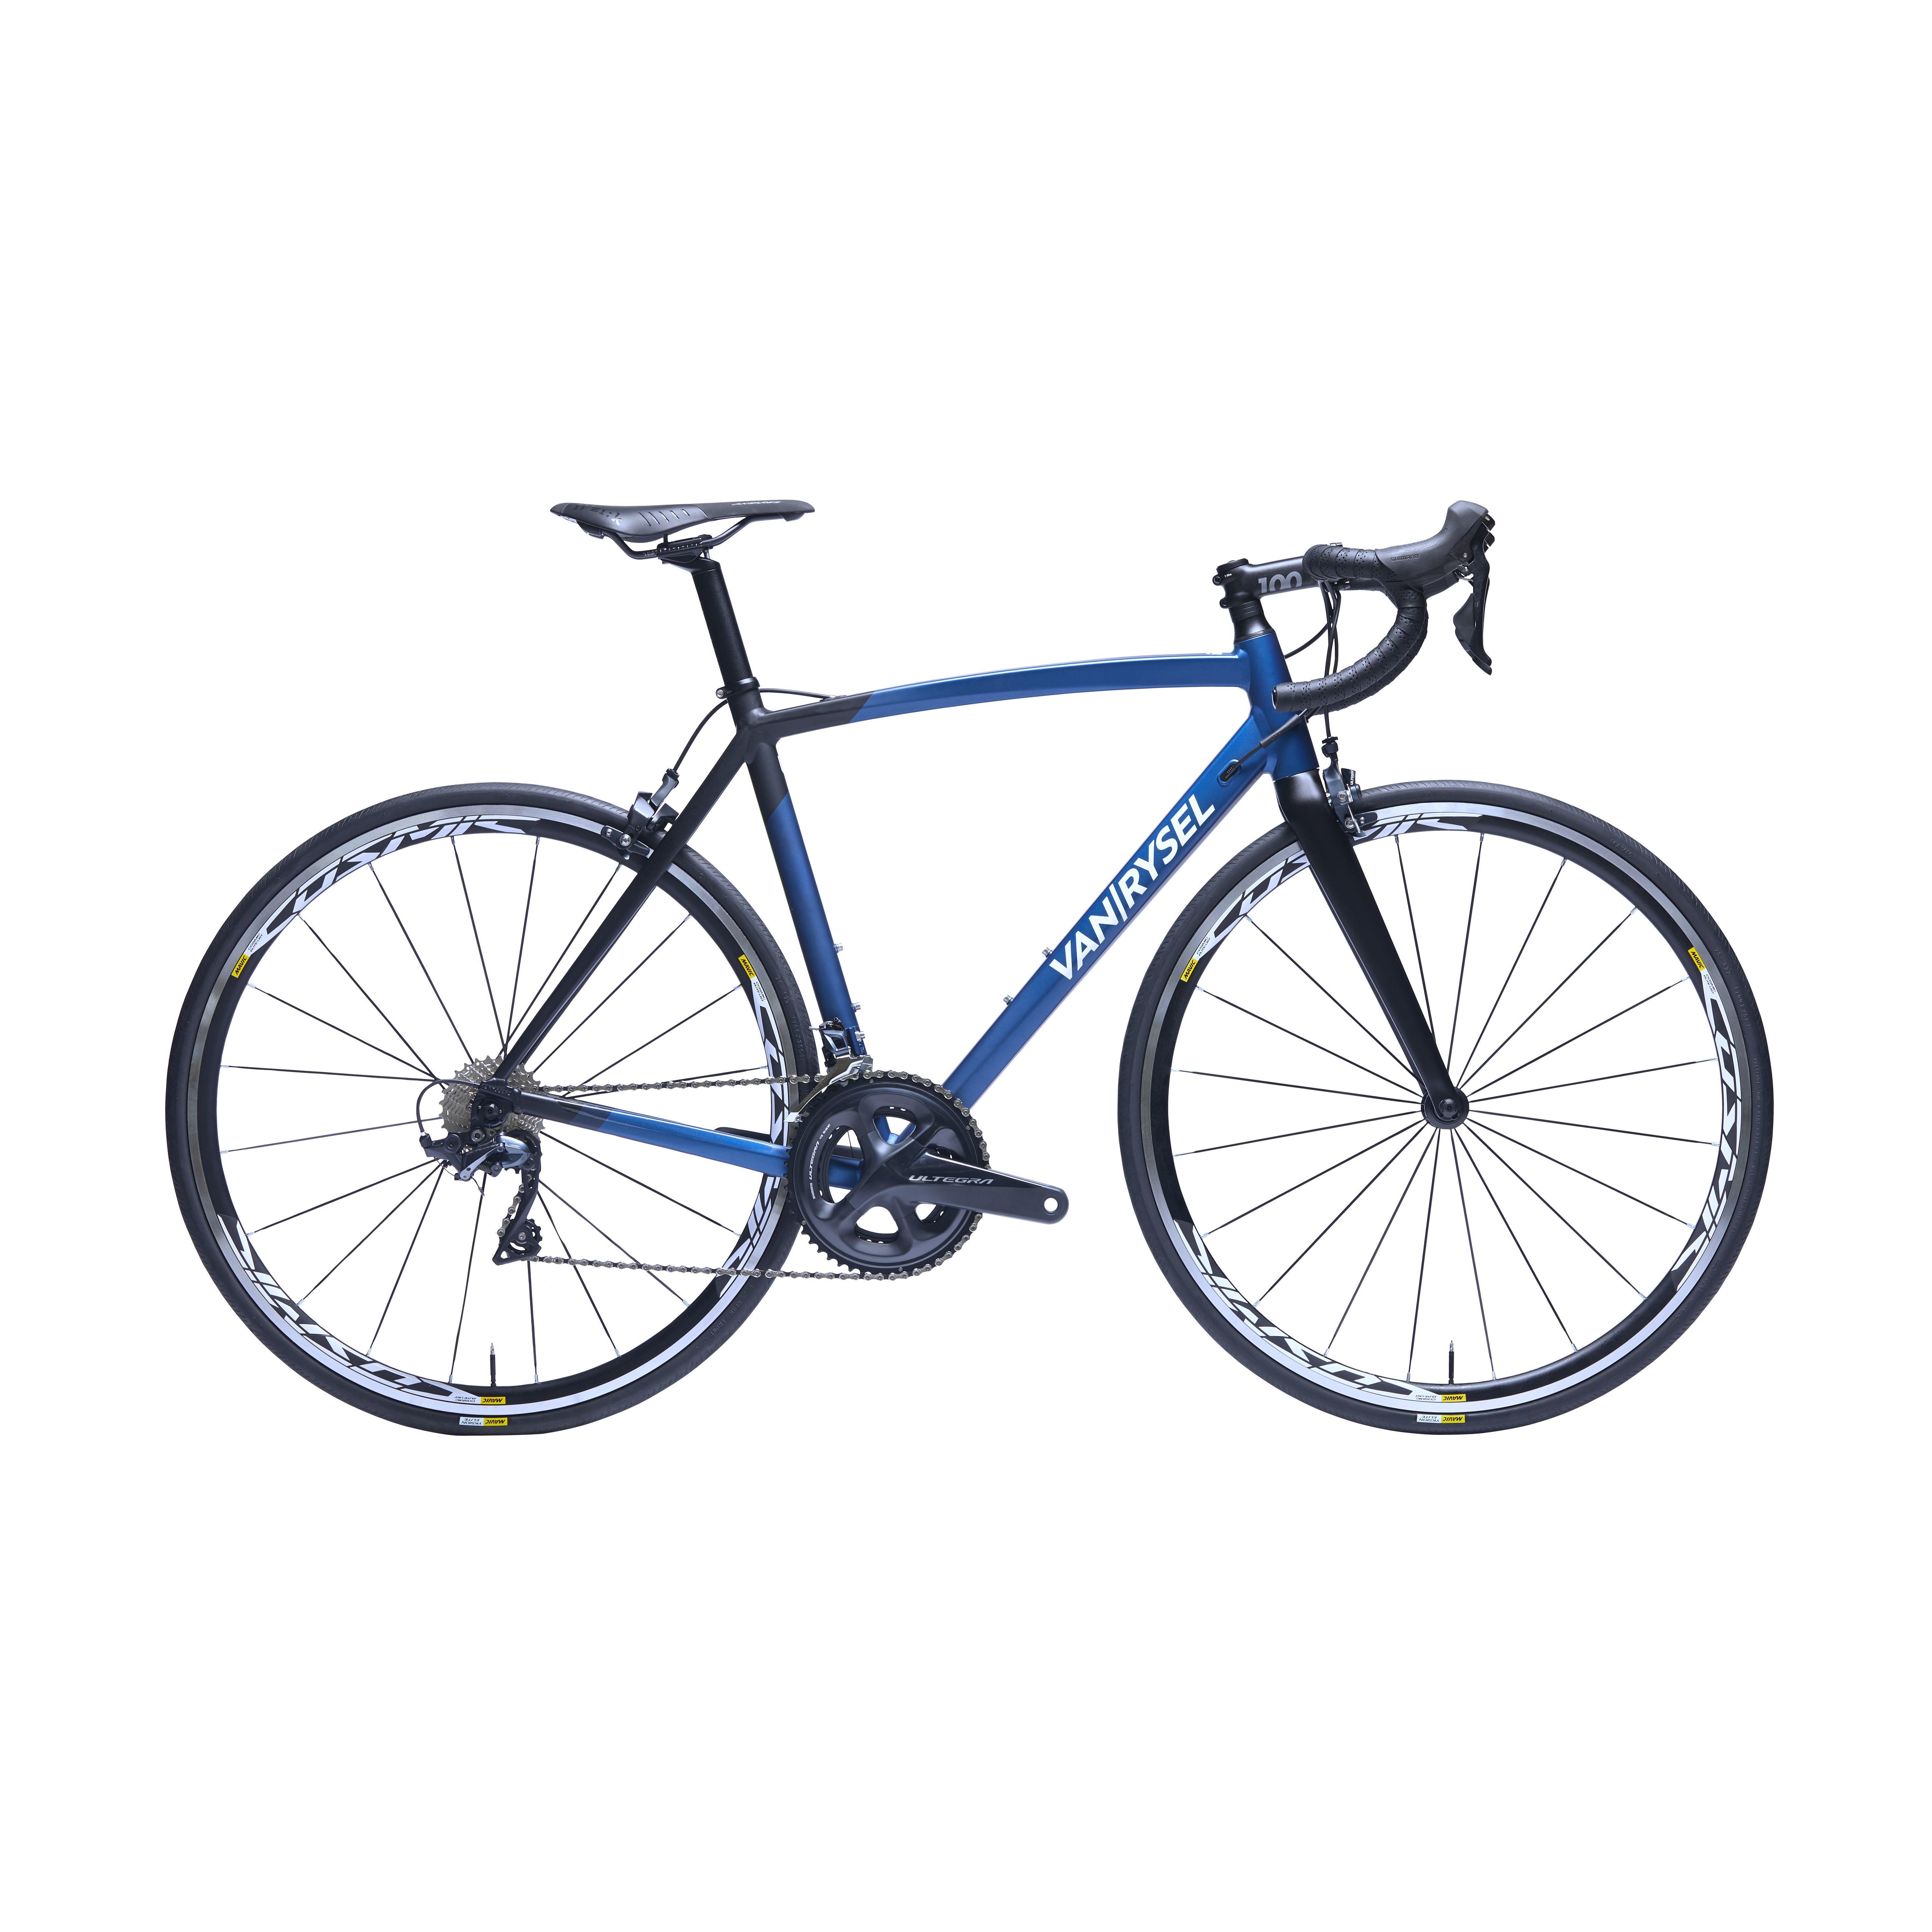 Van rysel Racefiets Ultra AF Ultegra blauw